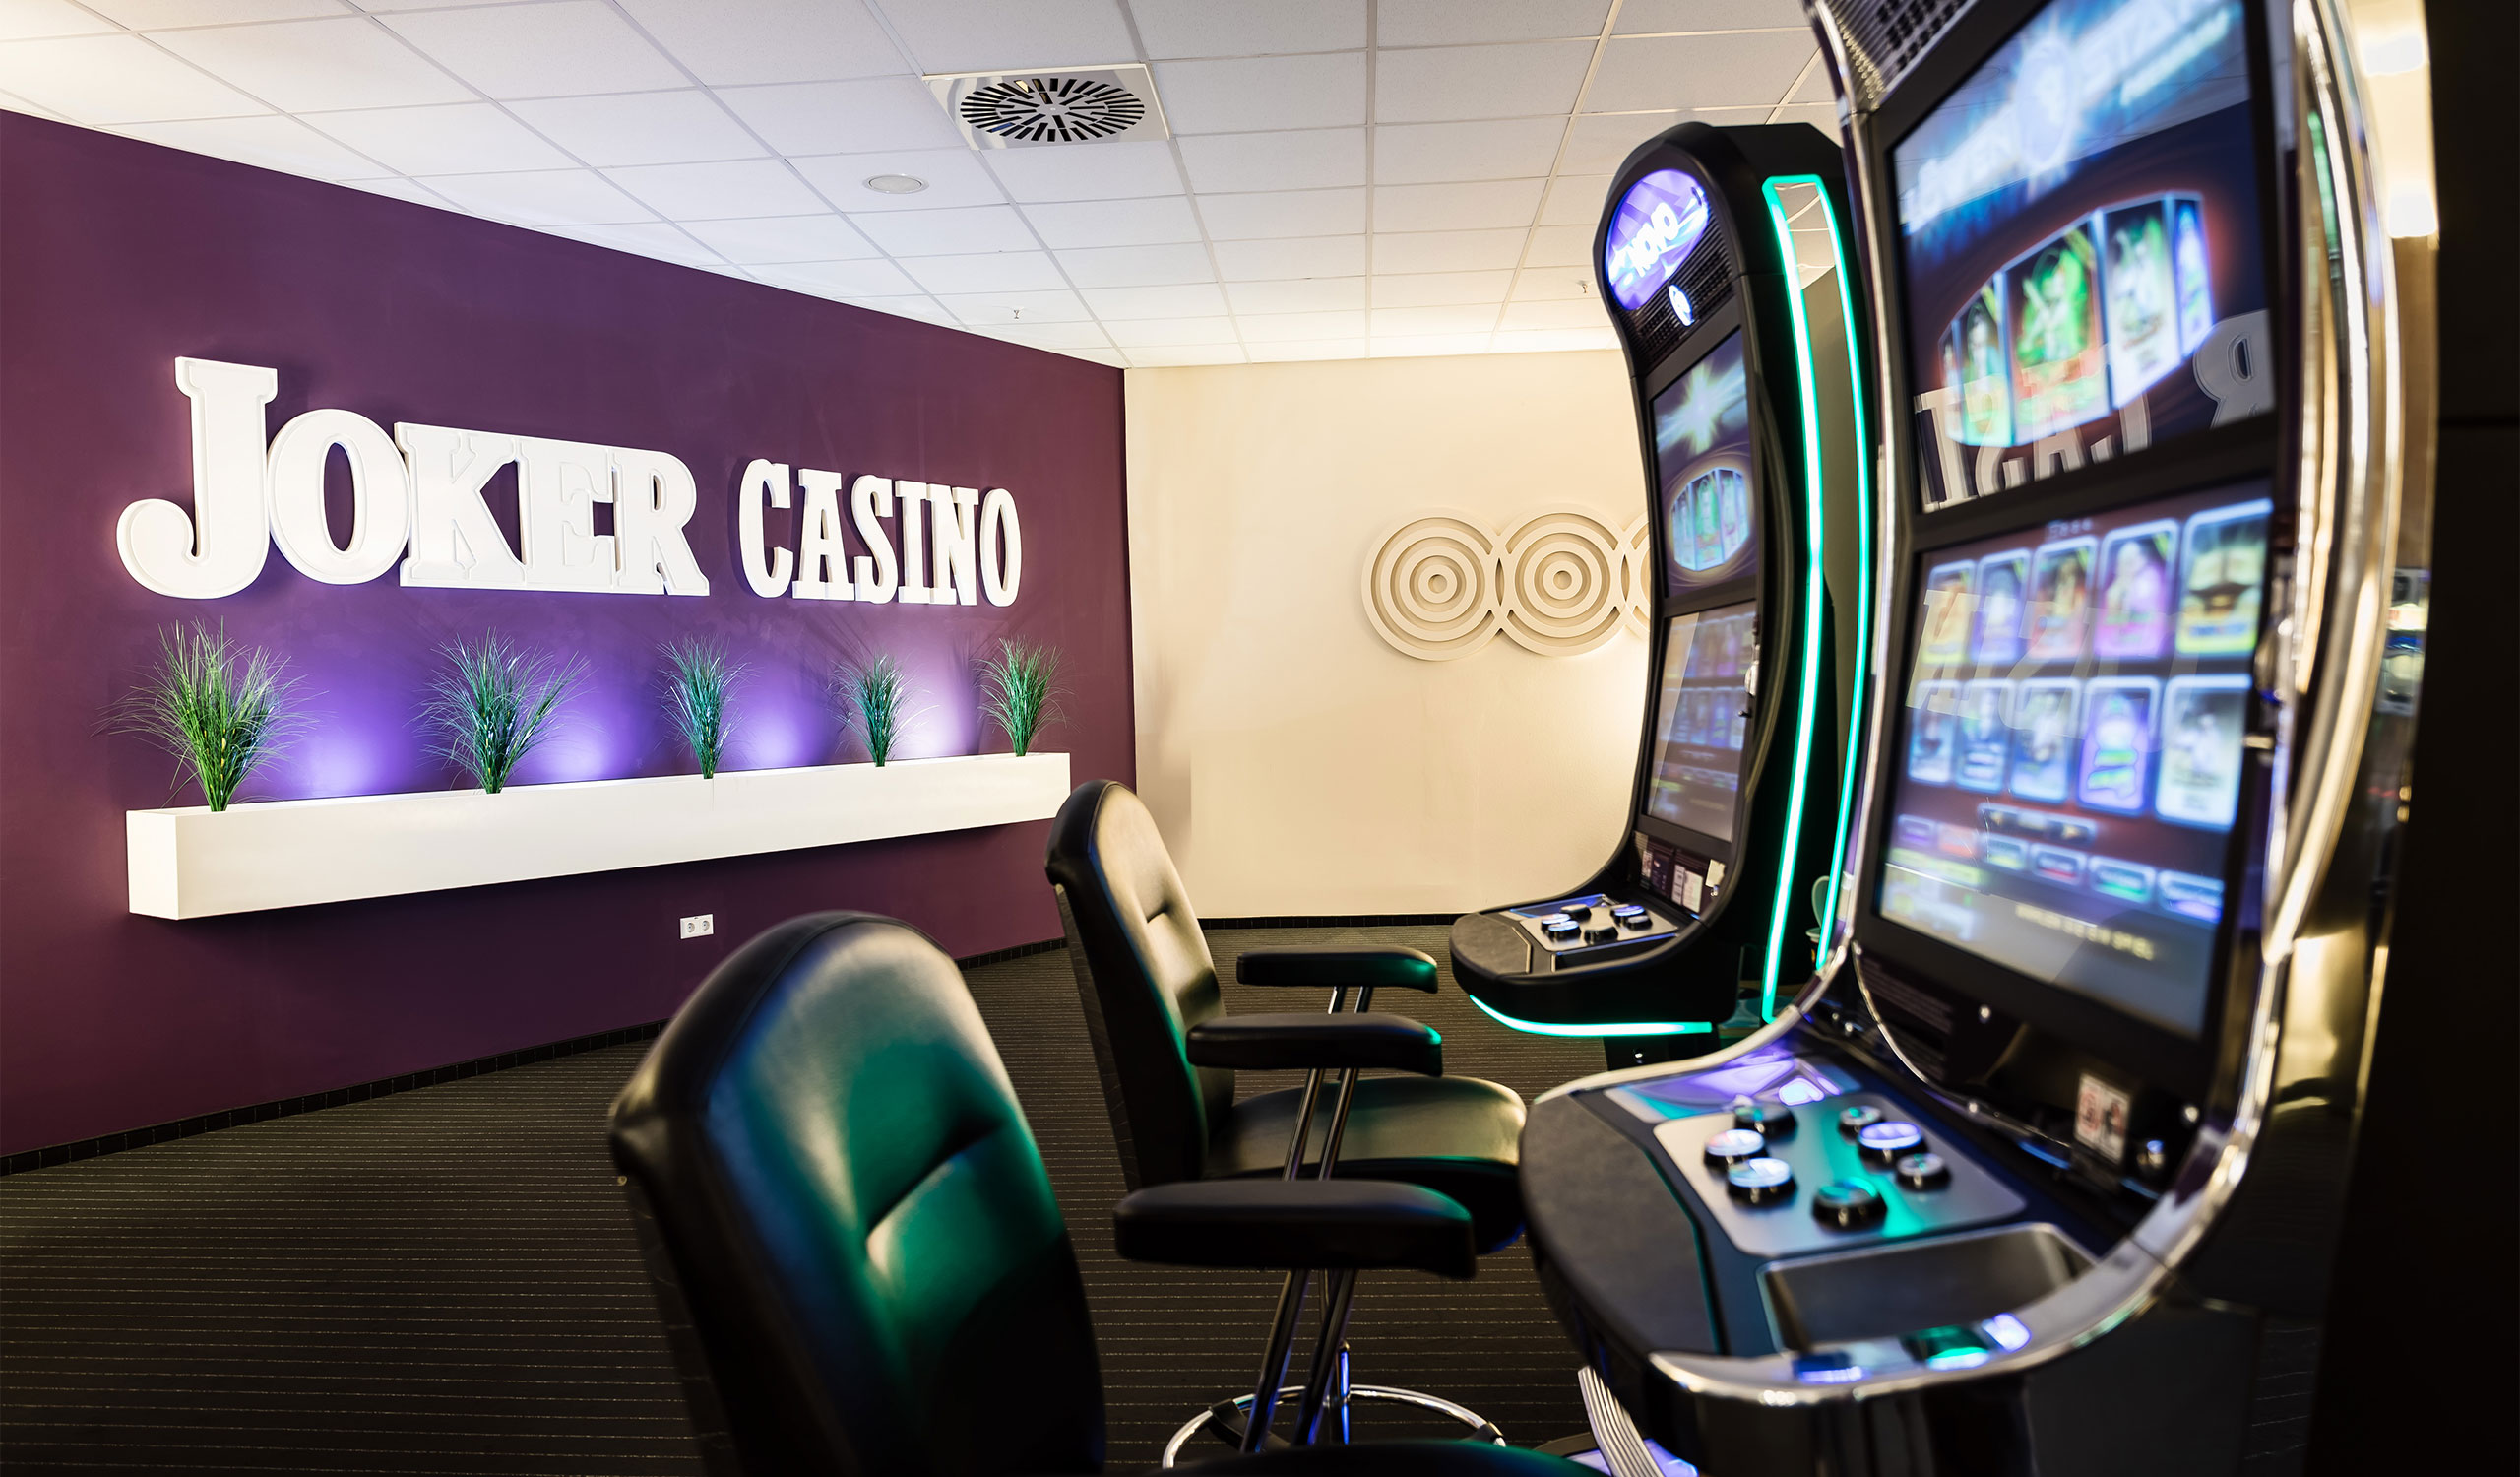 Joker Casino Baindt